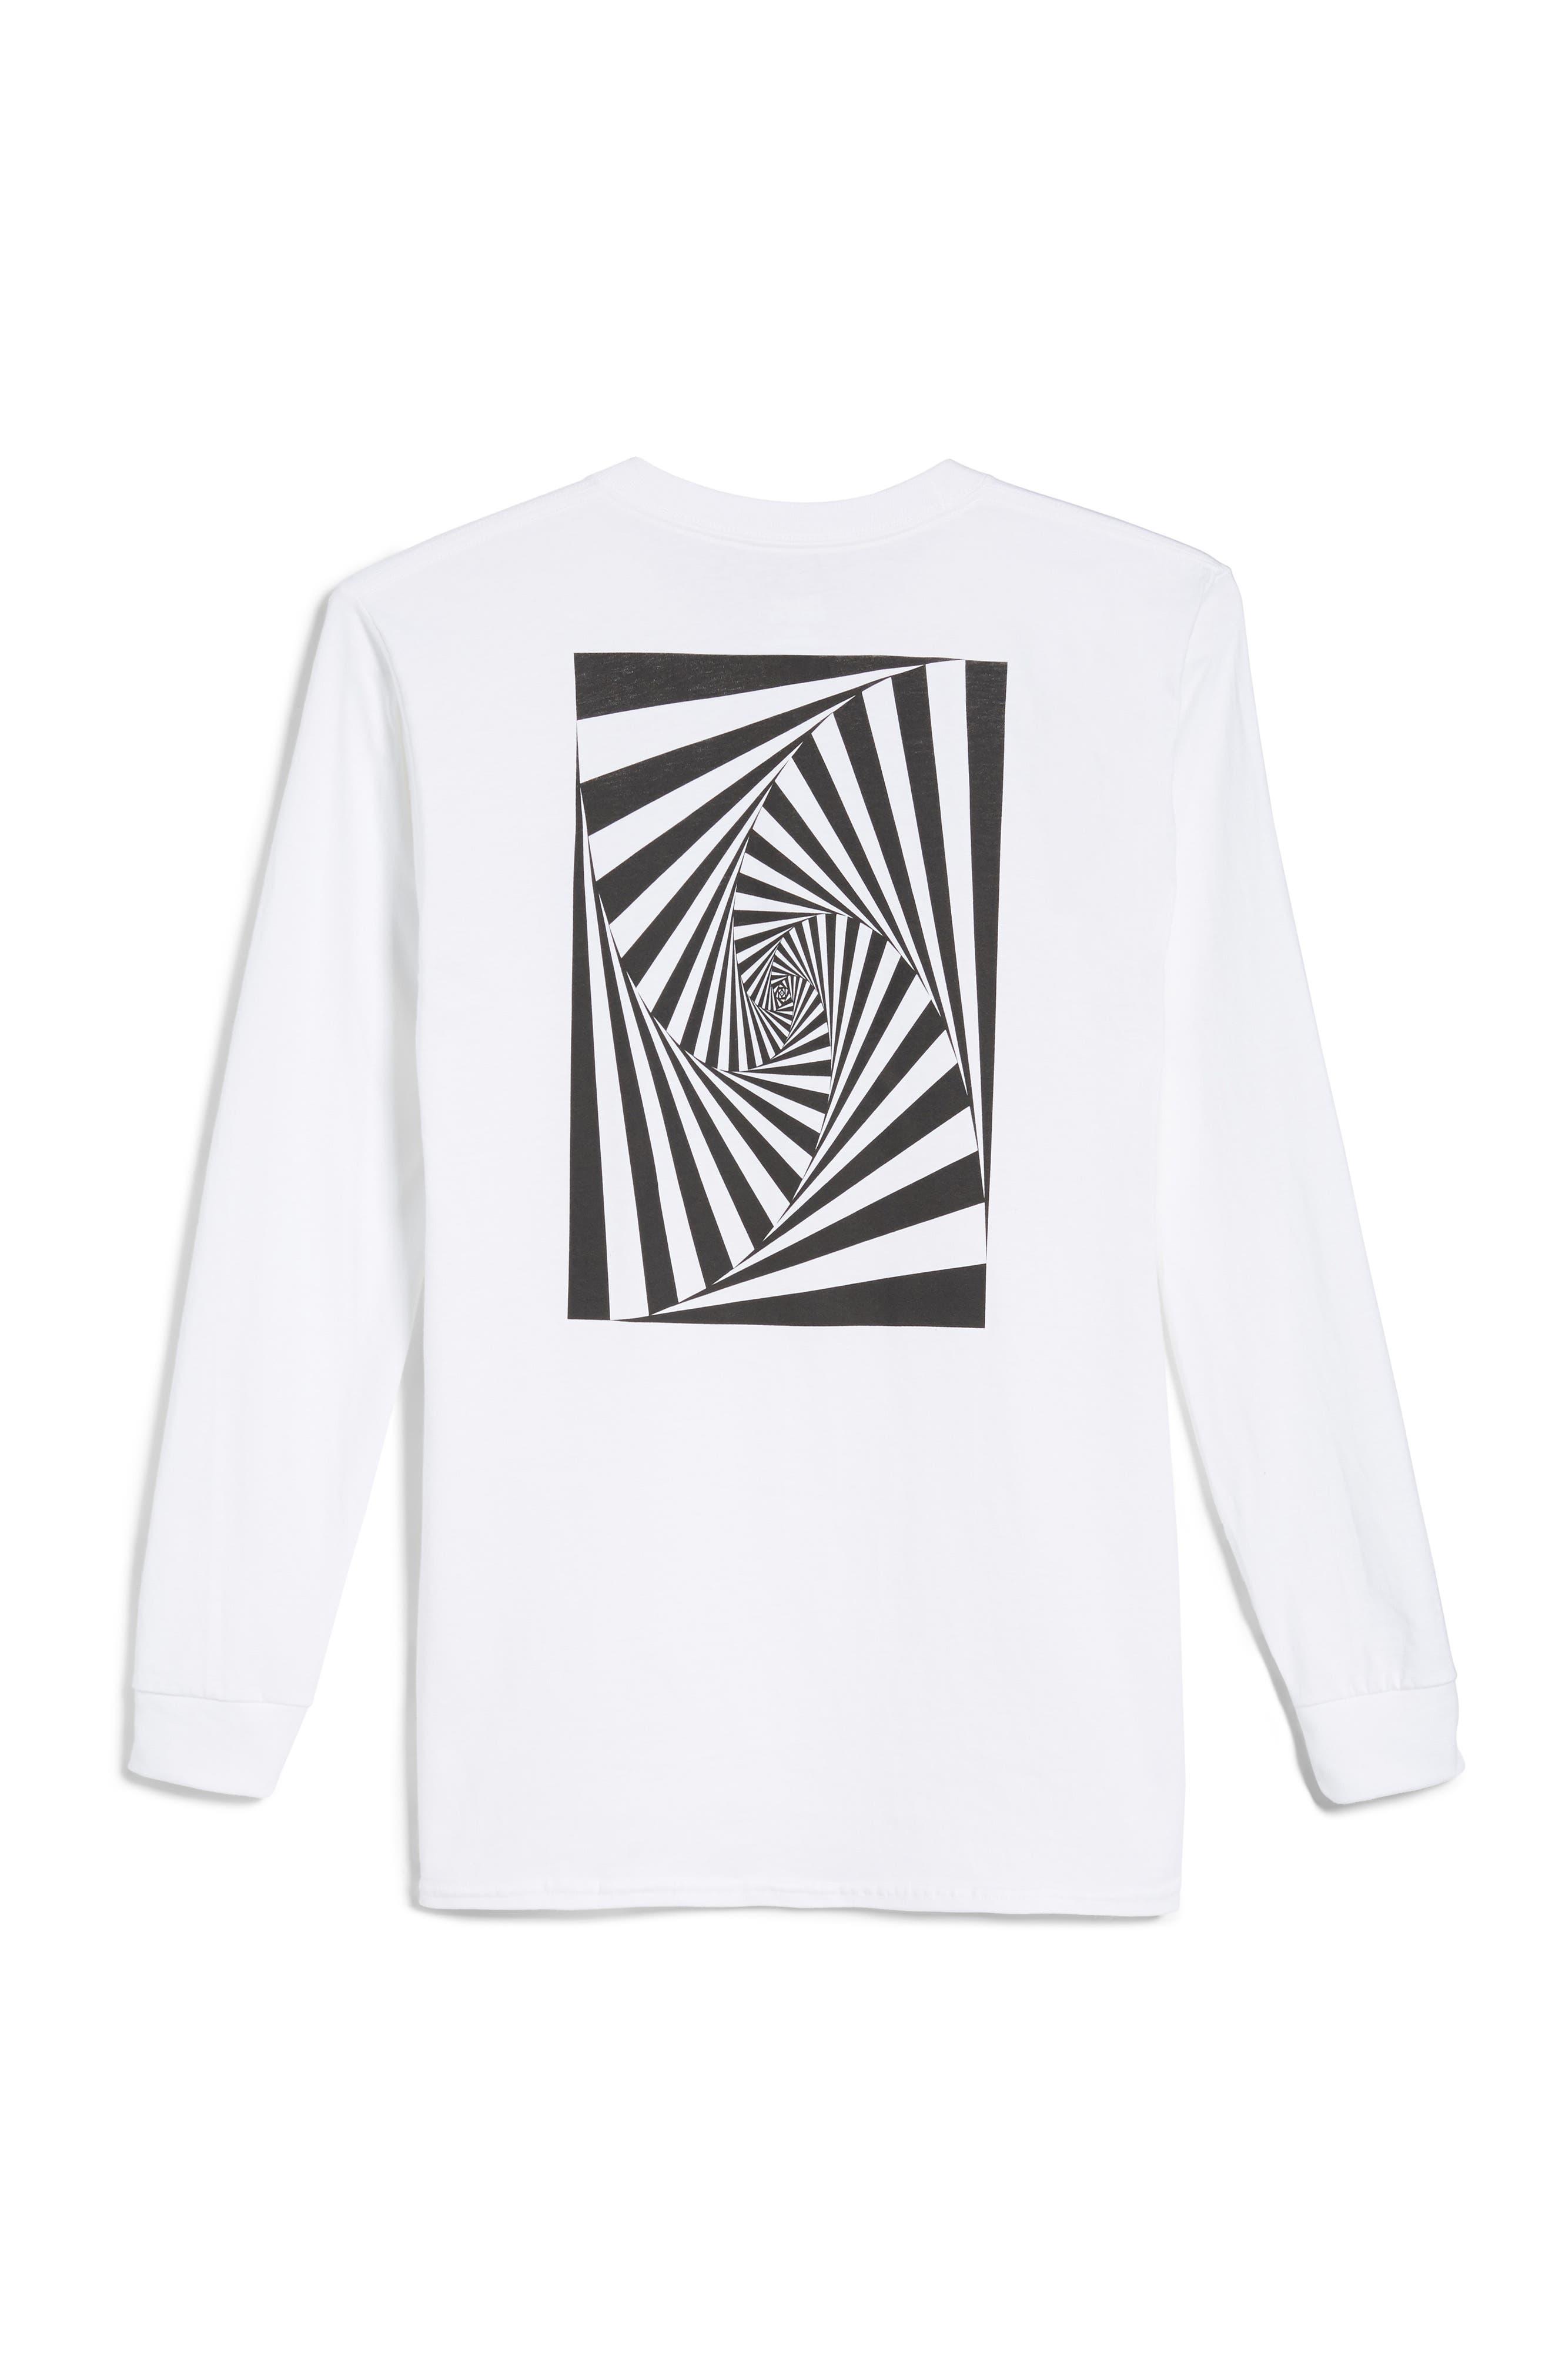 Vision Street Wear Long Sleeve T-Shirt,                         Main,                         color, 100